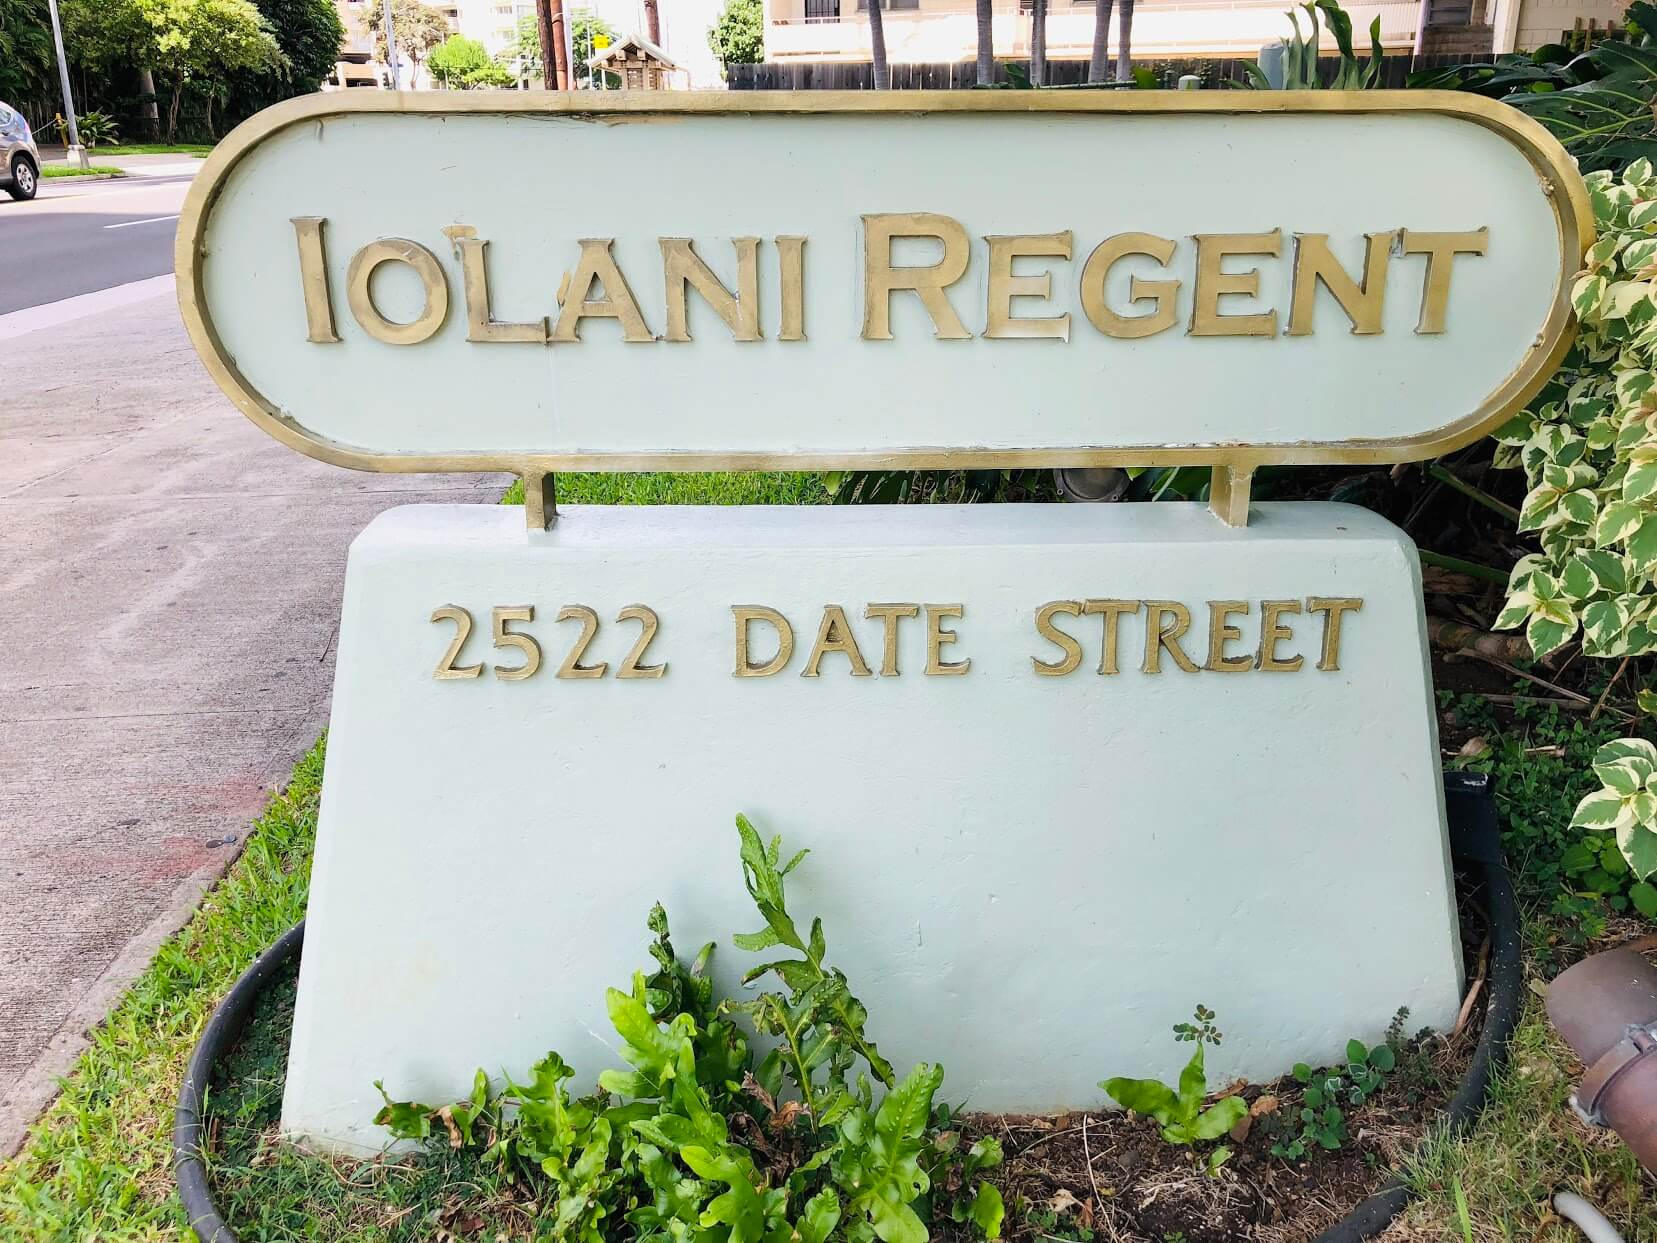 Iolani Regentの看板